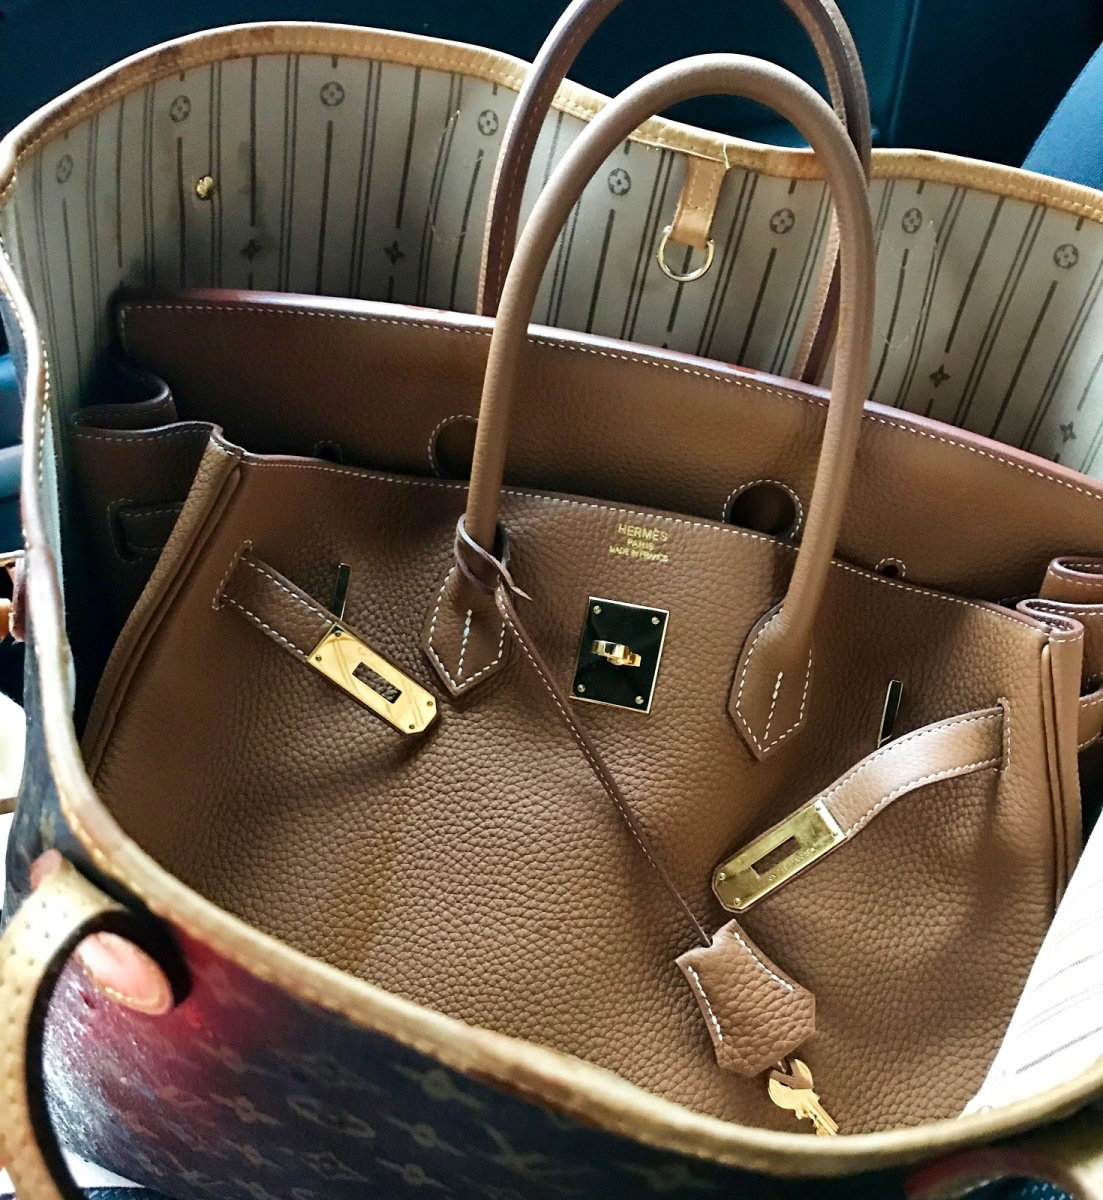 Oh my god - a new Birkin Bag in the house